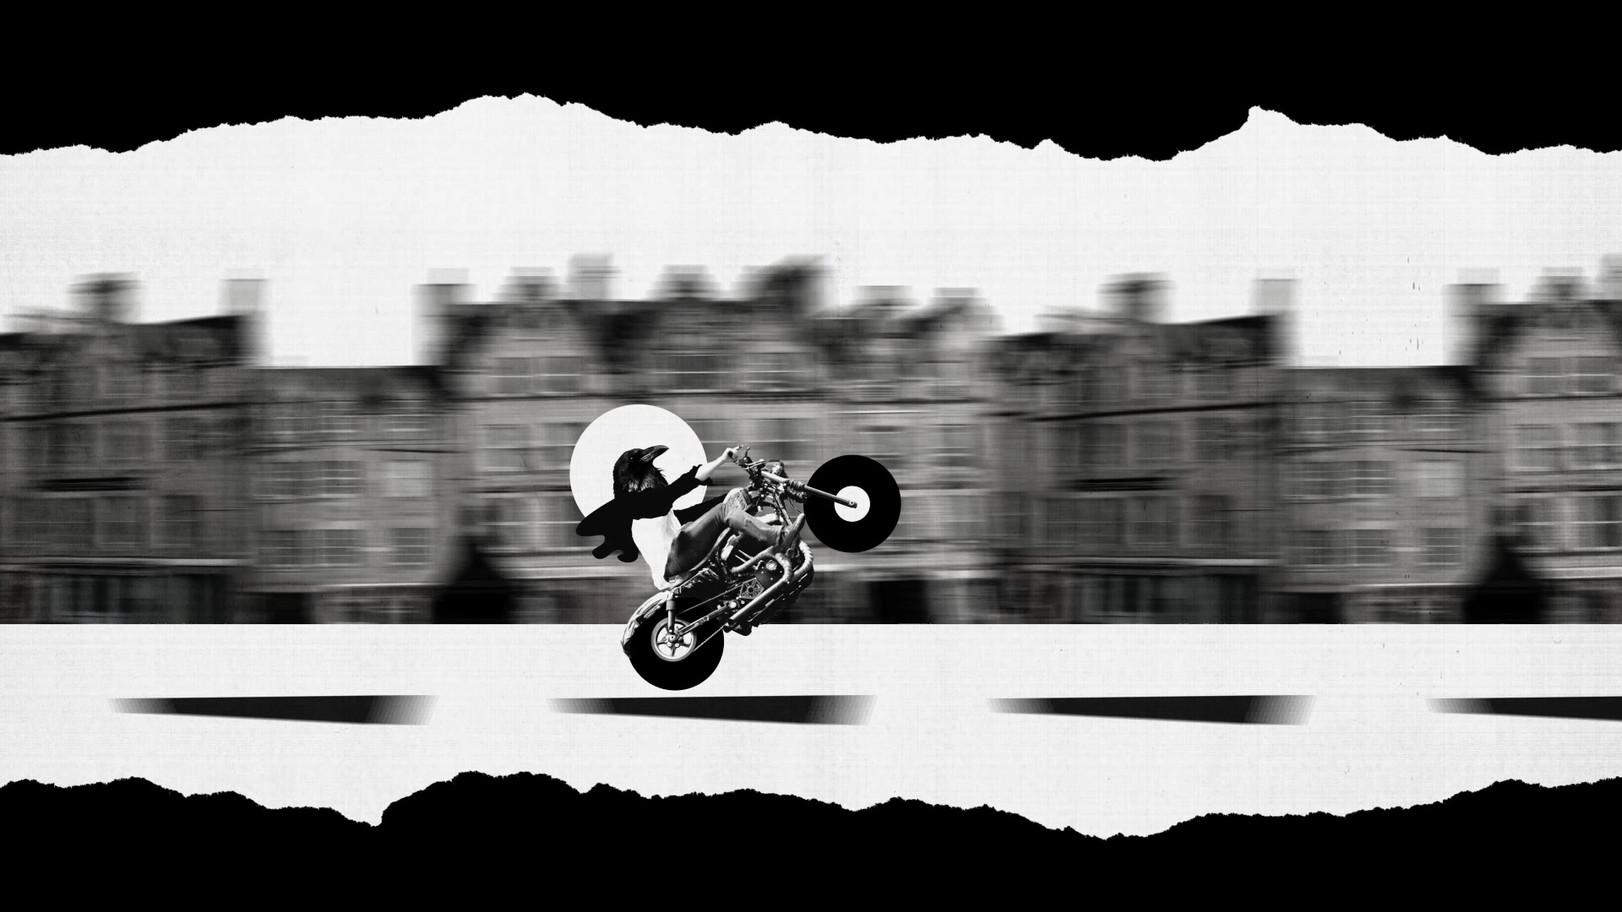 Motion_Collage_Edinburgh_5.mp4